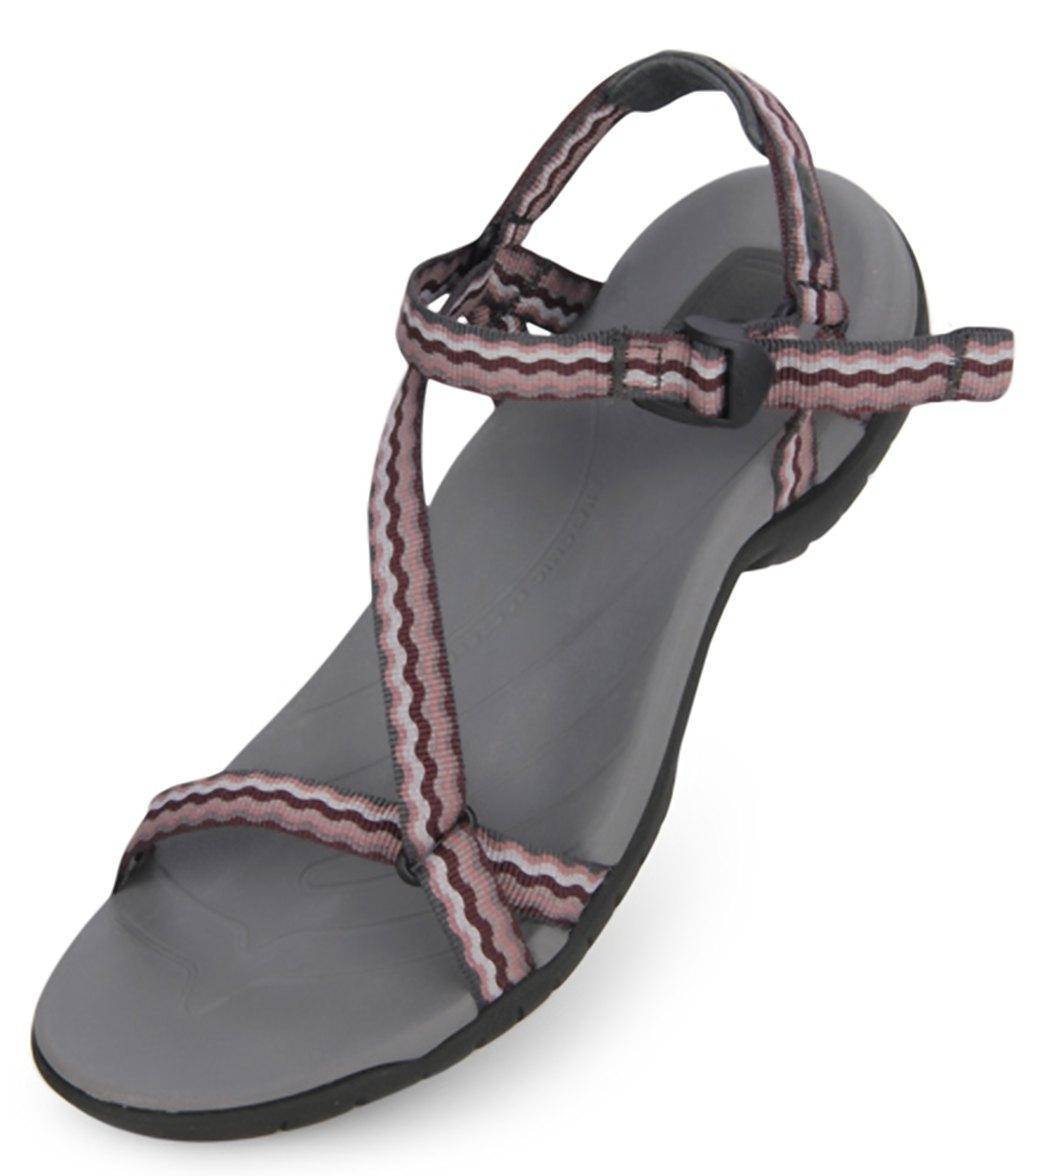 Women's zirra sandals -  Women S Zirra Sandal Play Video View All Colors